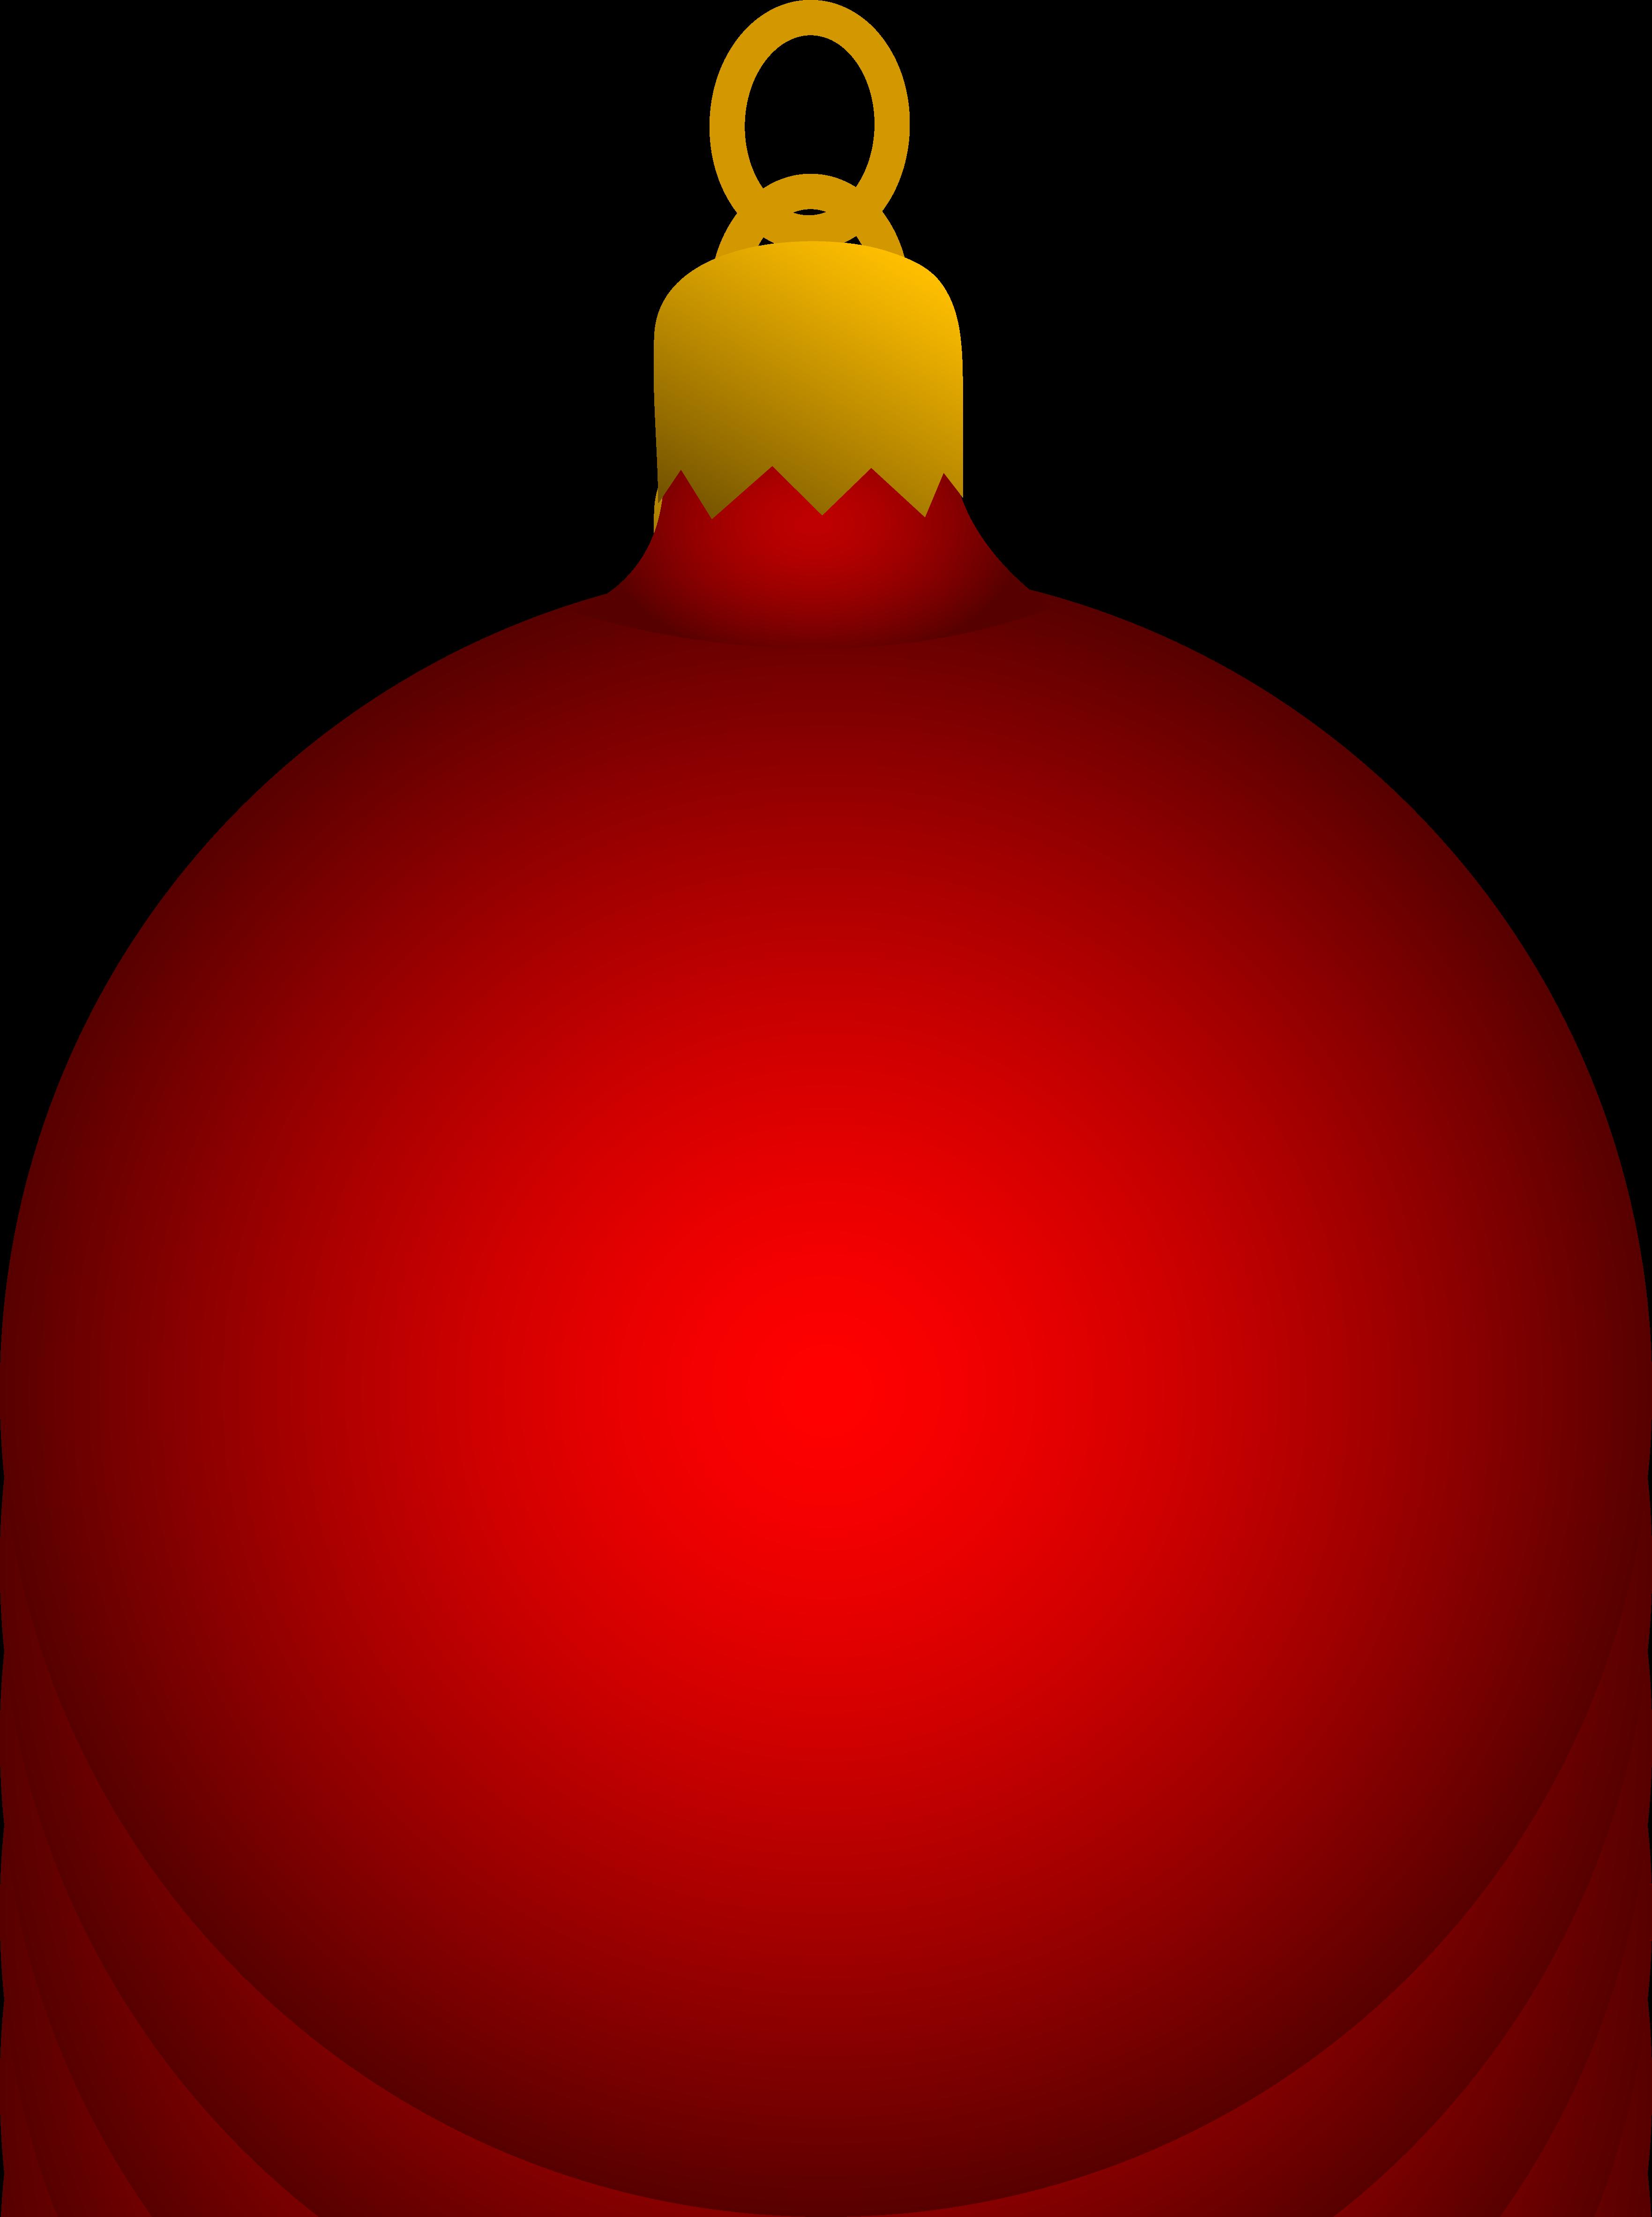 ornament clipart